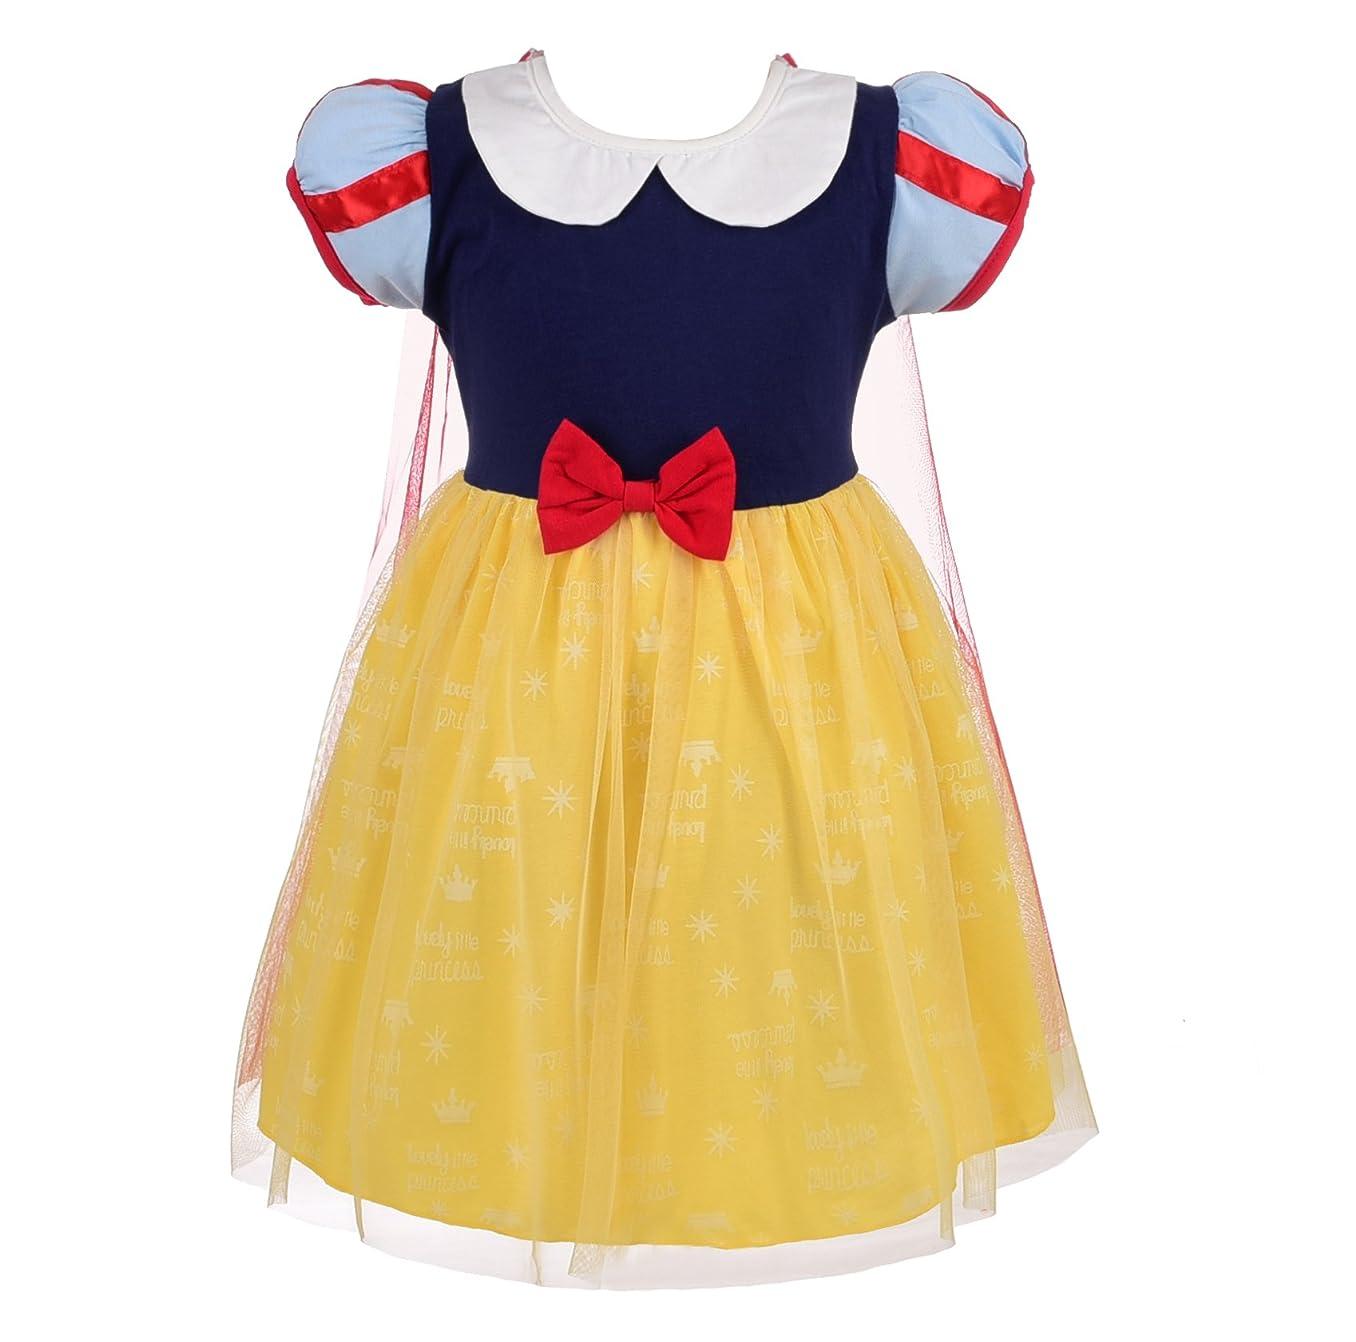 Dressy Daisy Baby Toddler Princess Snow White Anna Elsa Sofia Alice Mermaid Dress